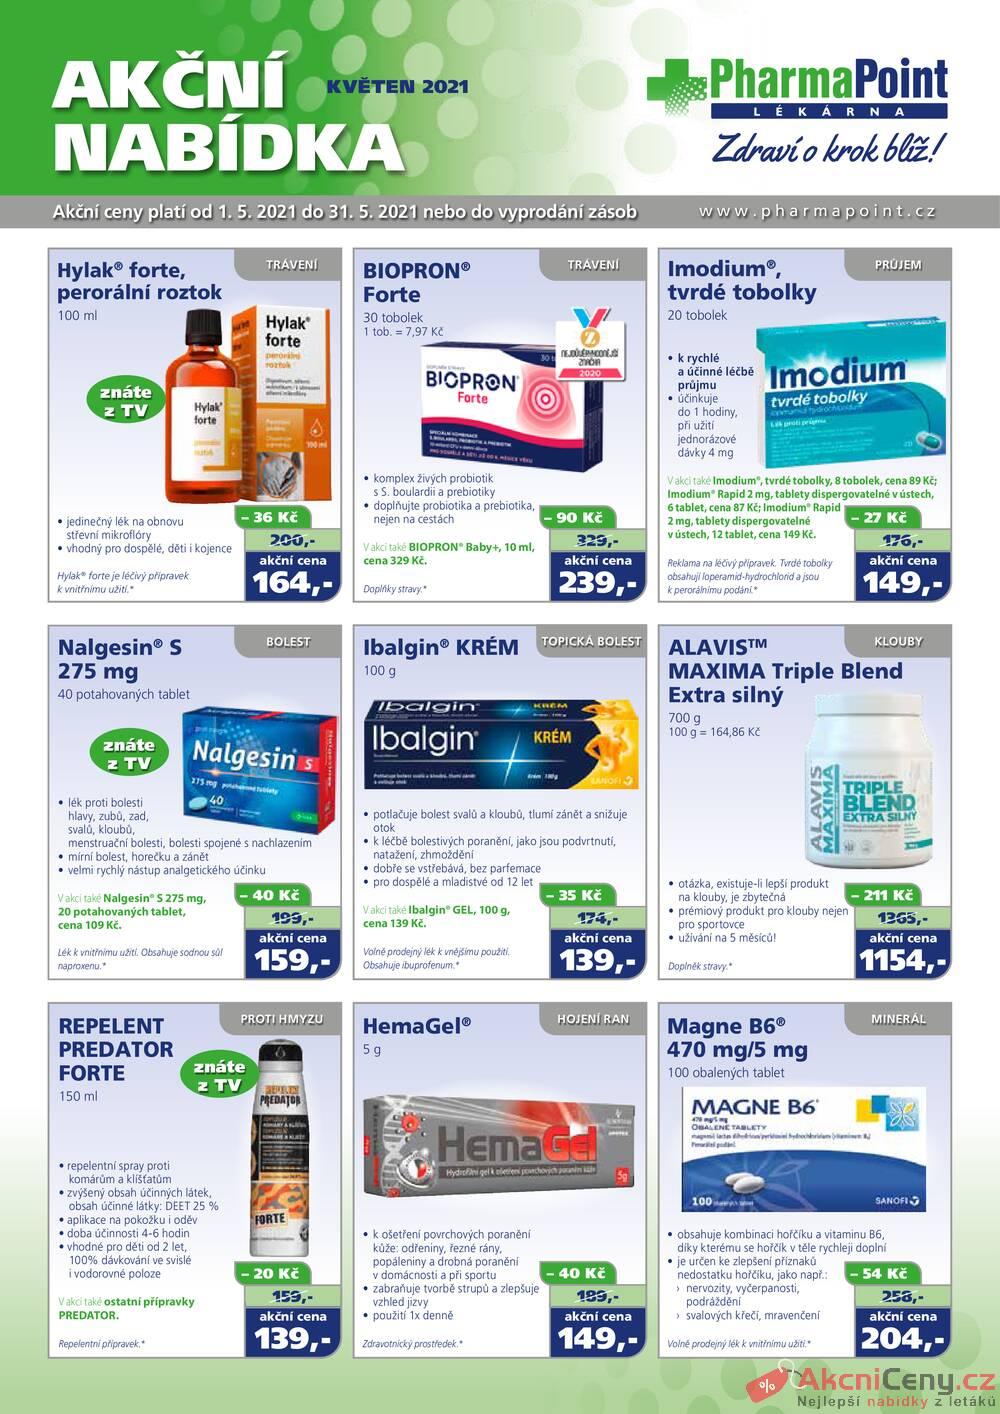 Leták PharmaPoint  - Pharma Point typ A od 1.5. do 31.5.2021 - strana 1